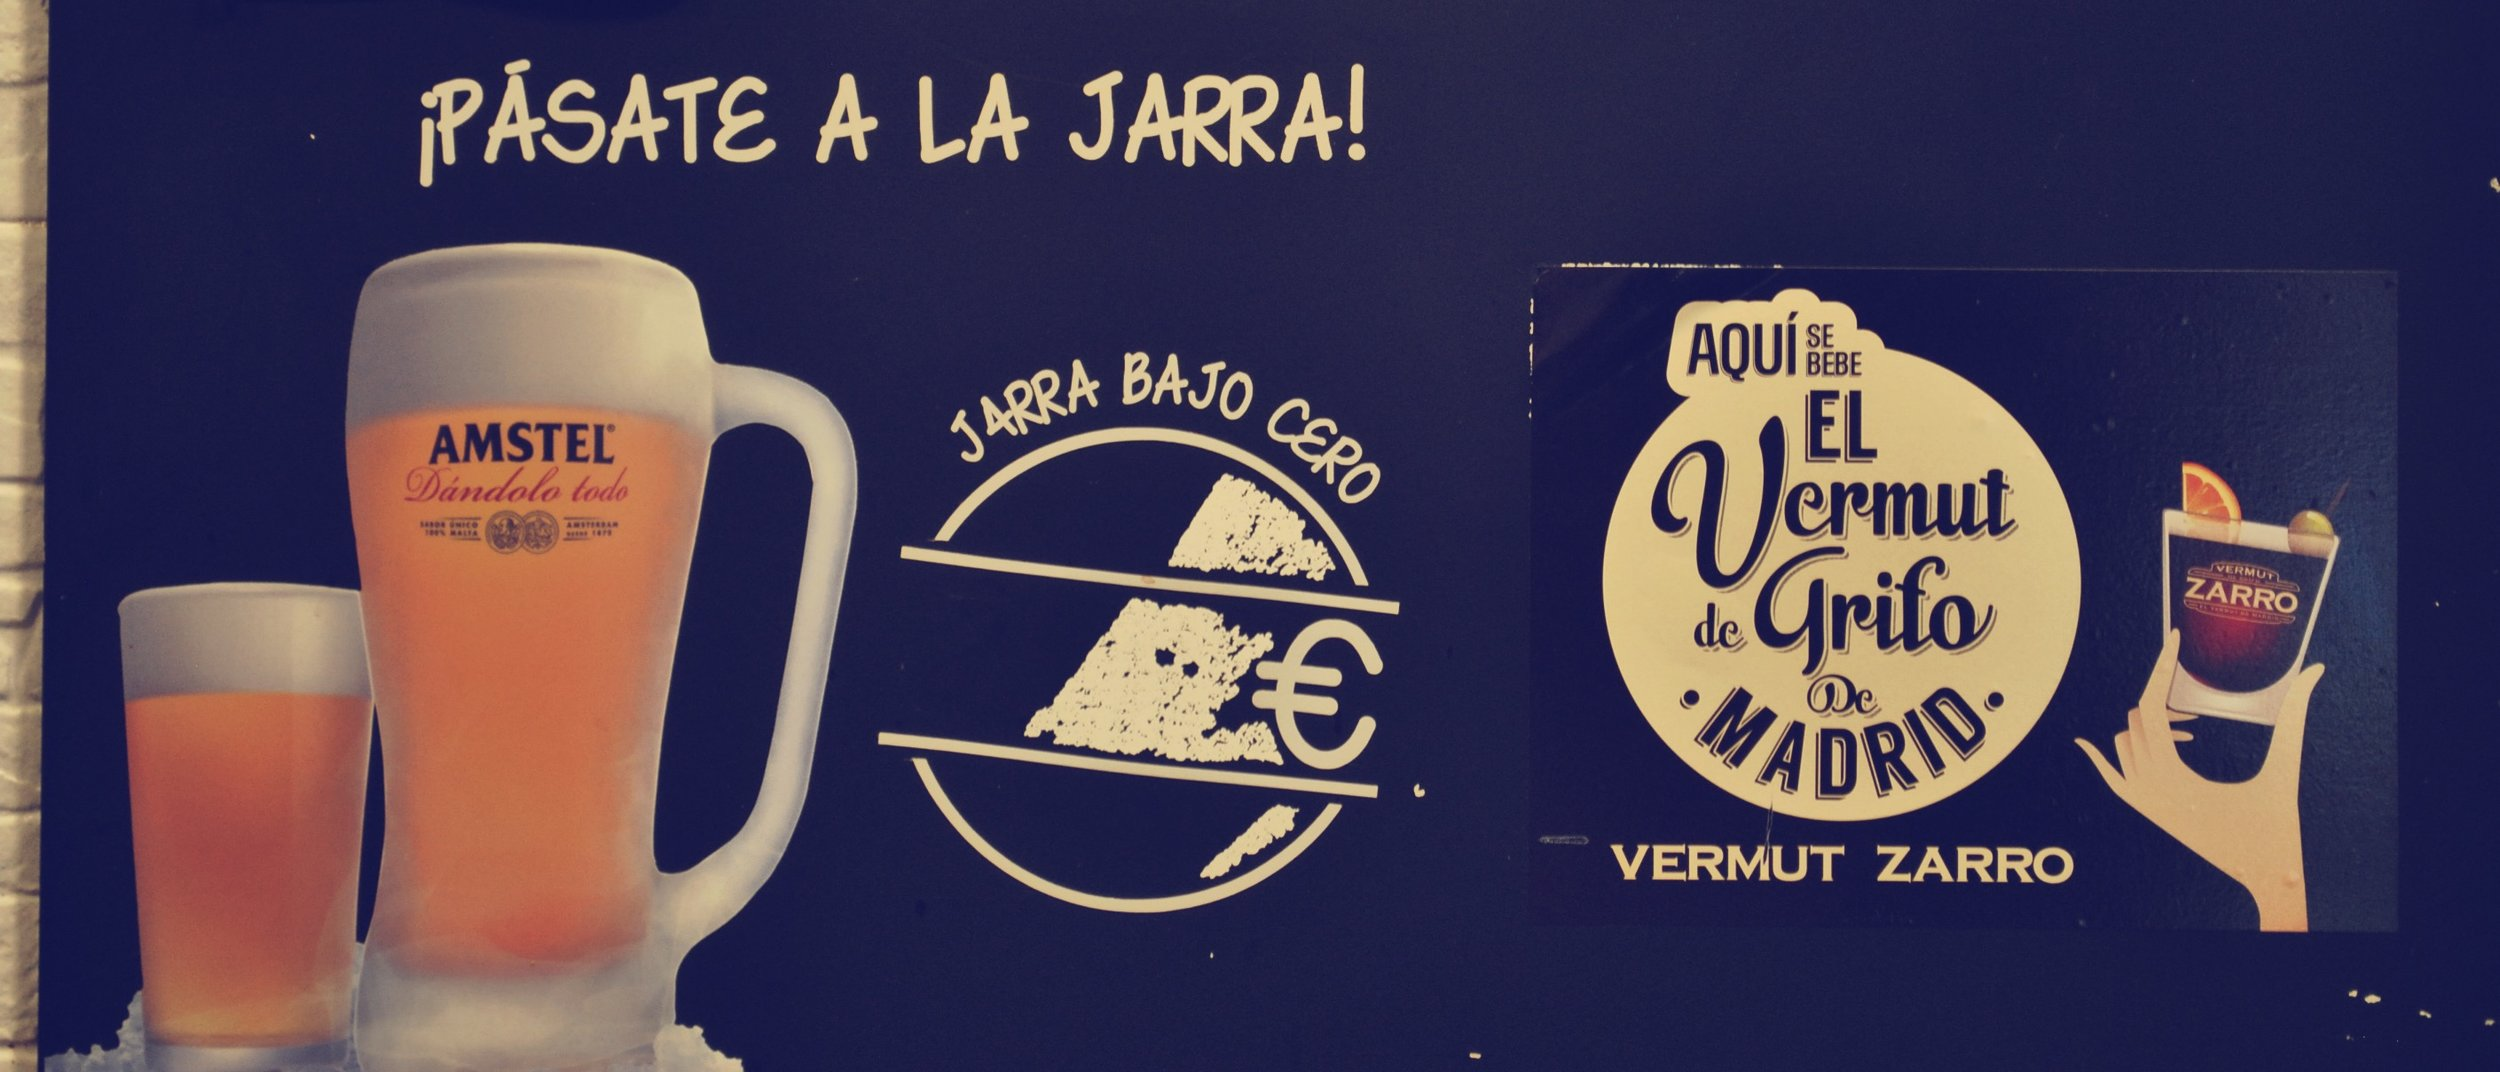 pasate_a_la_jarra.jpg